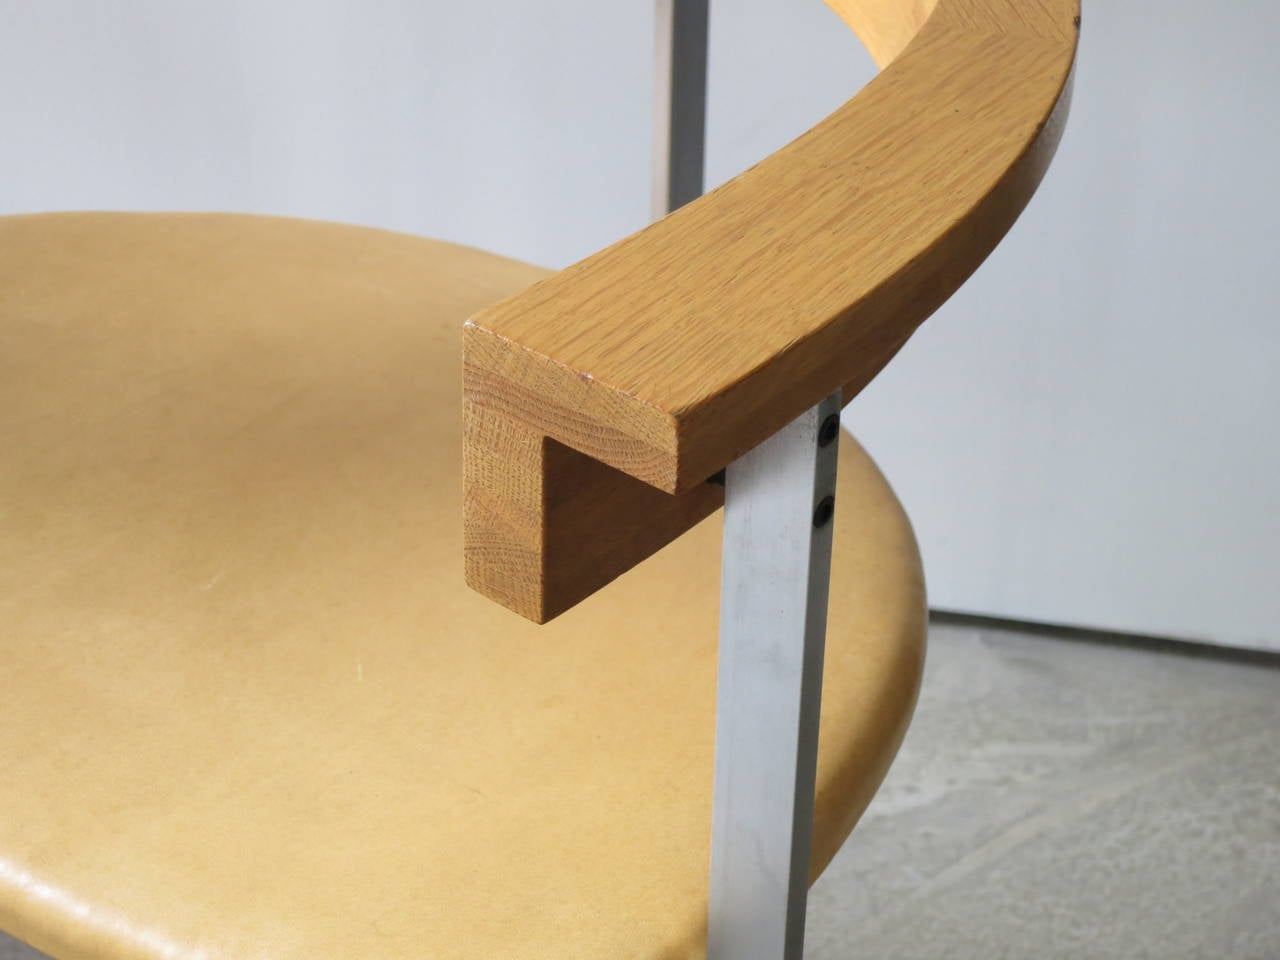 Scandinavian Modern Pair of PK-11 Armchairs by Poul Kjærholm, made by E. Kold Christensen For Sale